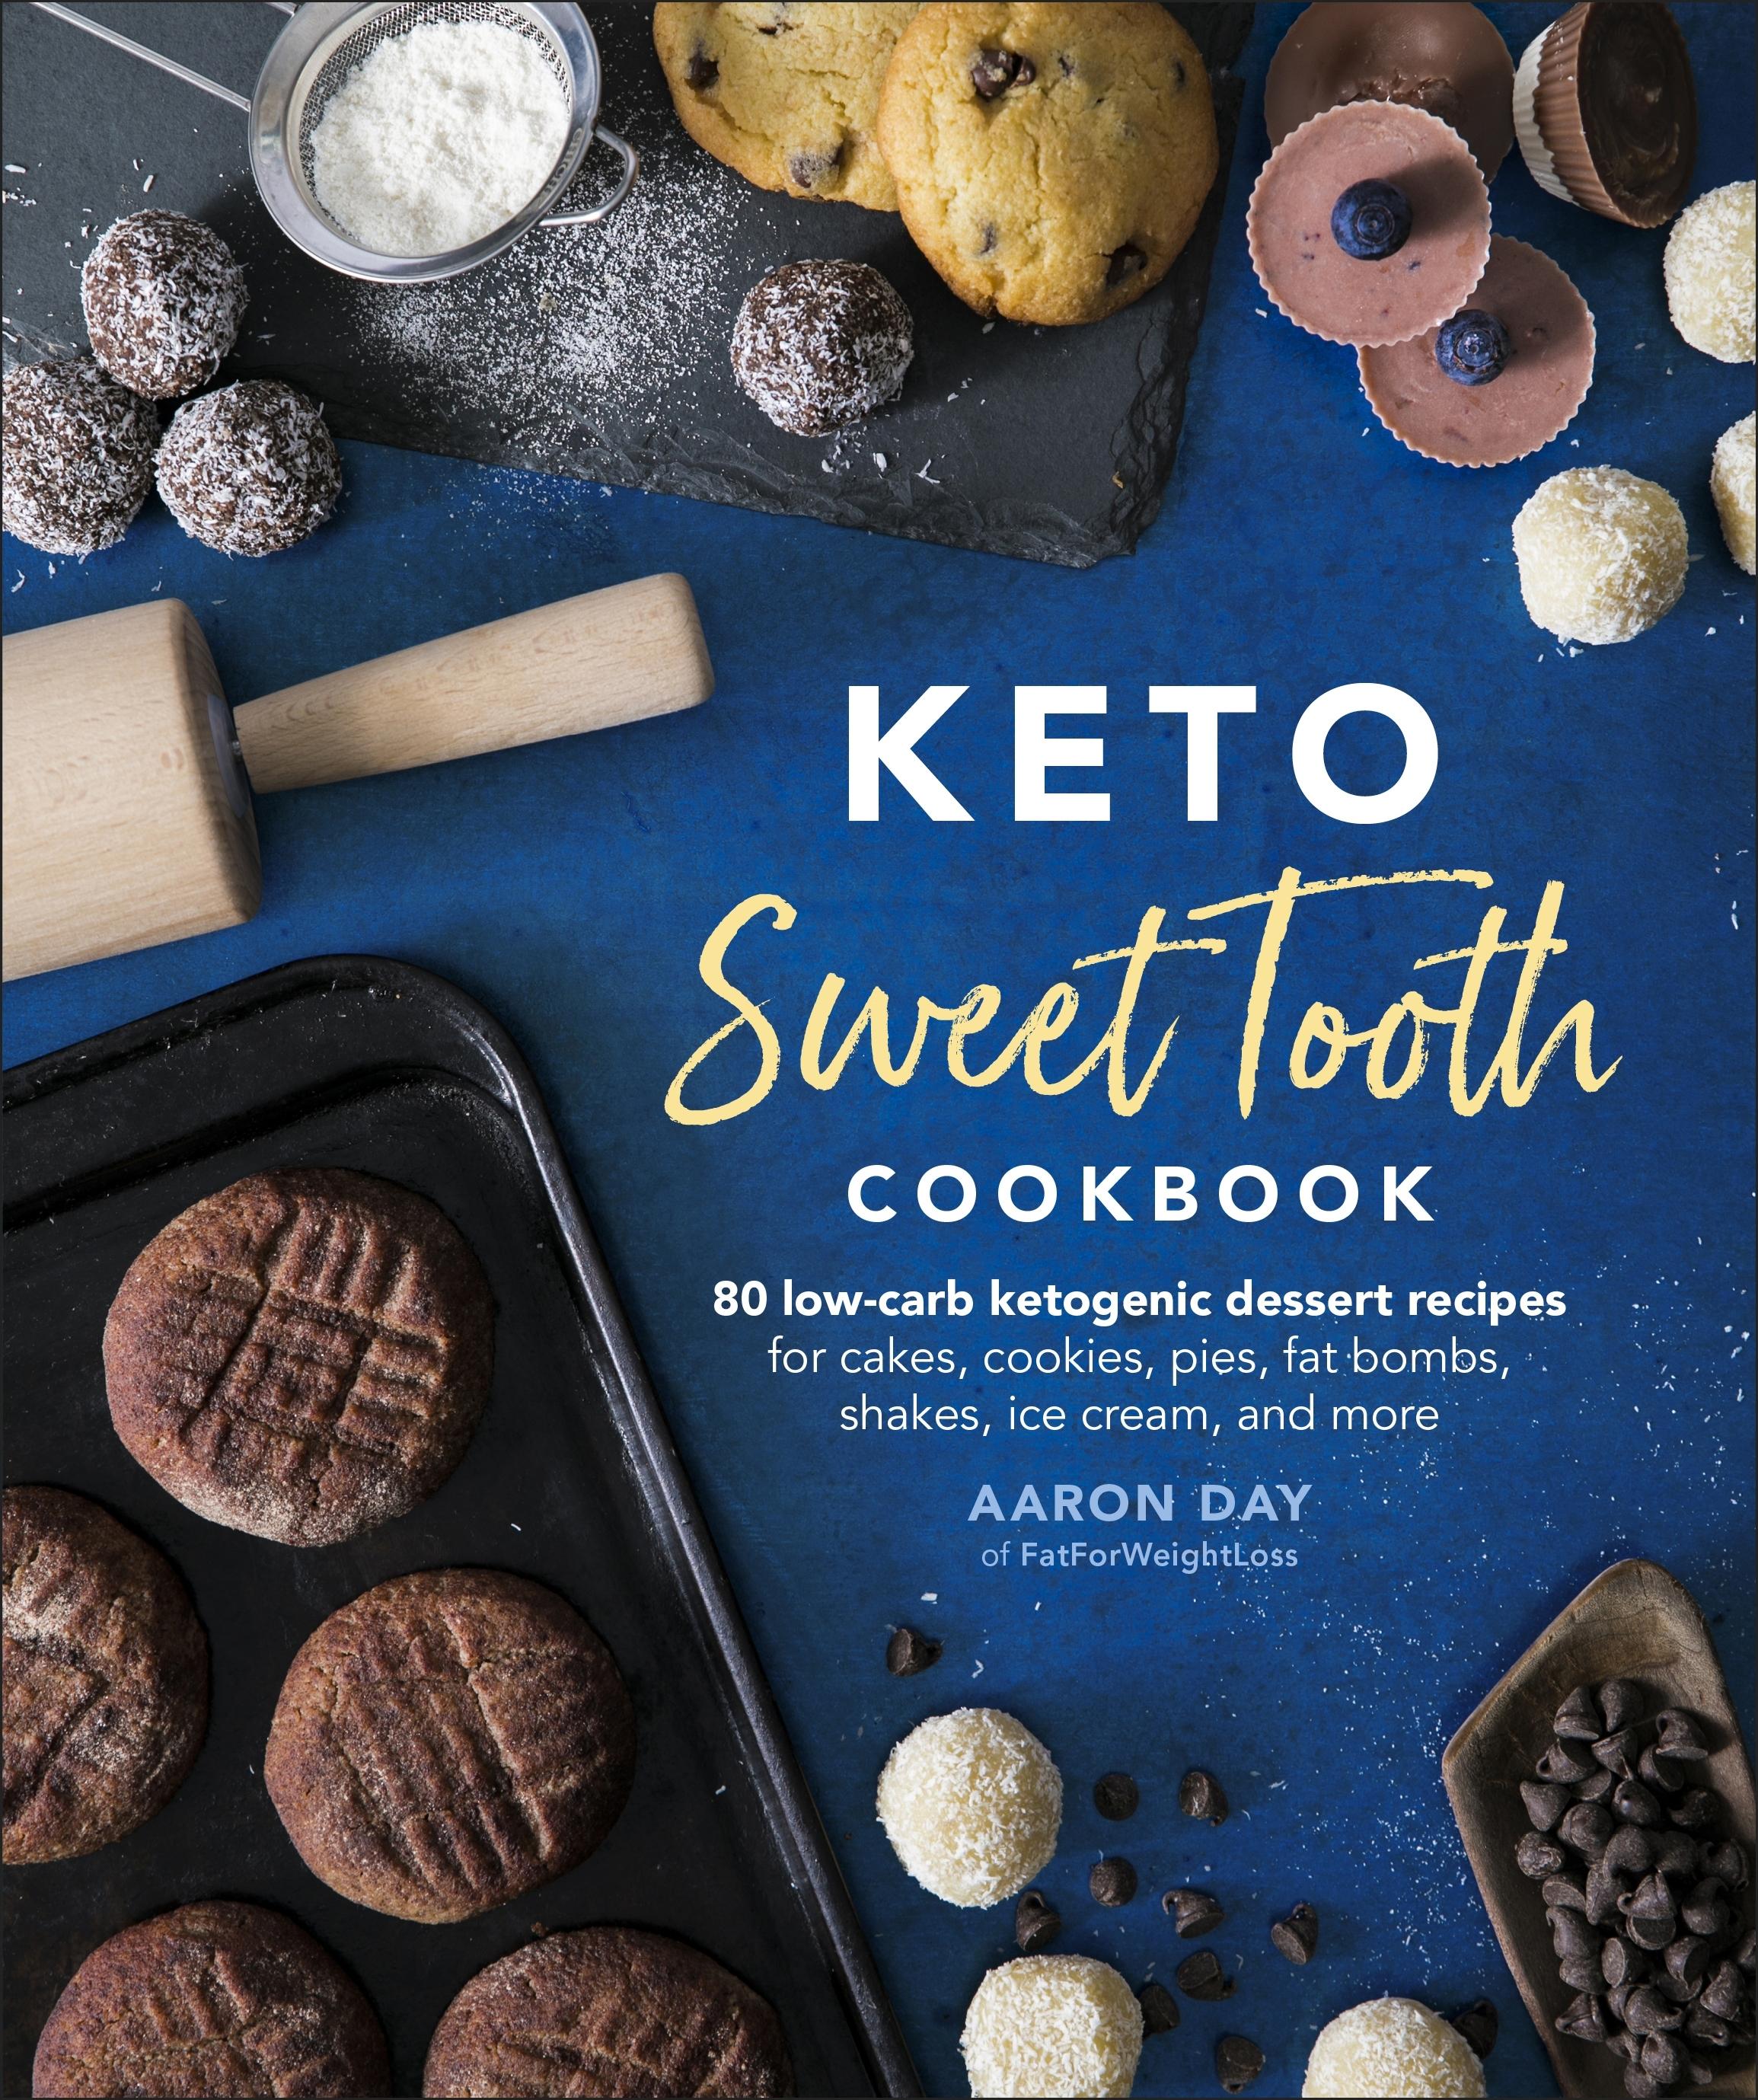 Keto Sweet Tooth Cookbook Penguin Books New Zealand